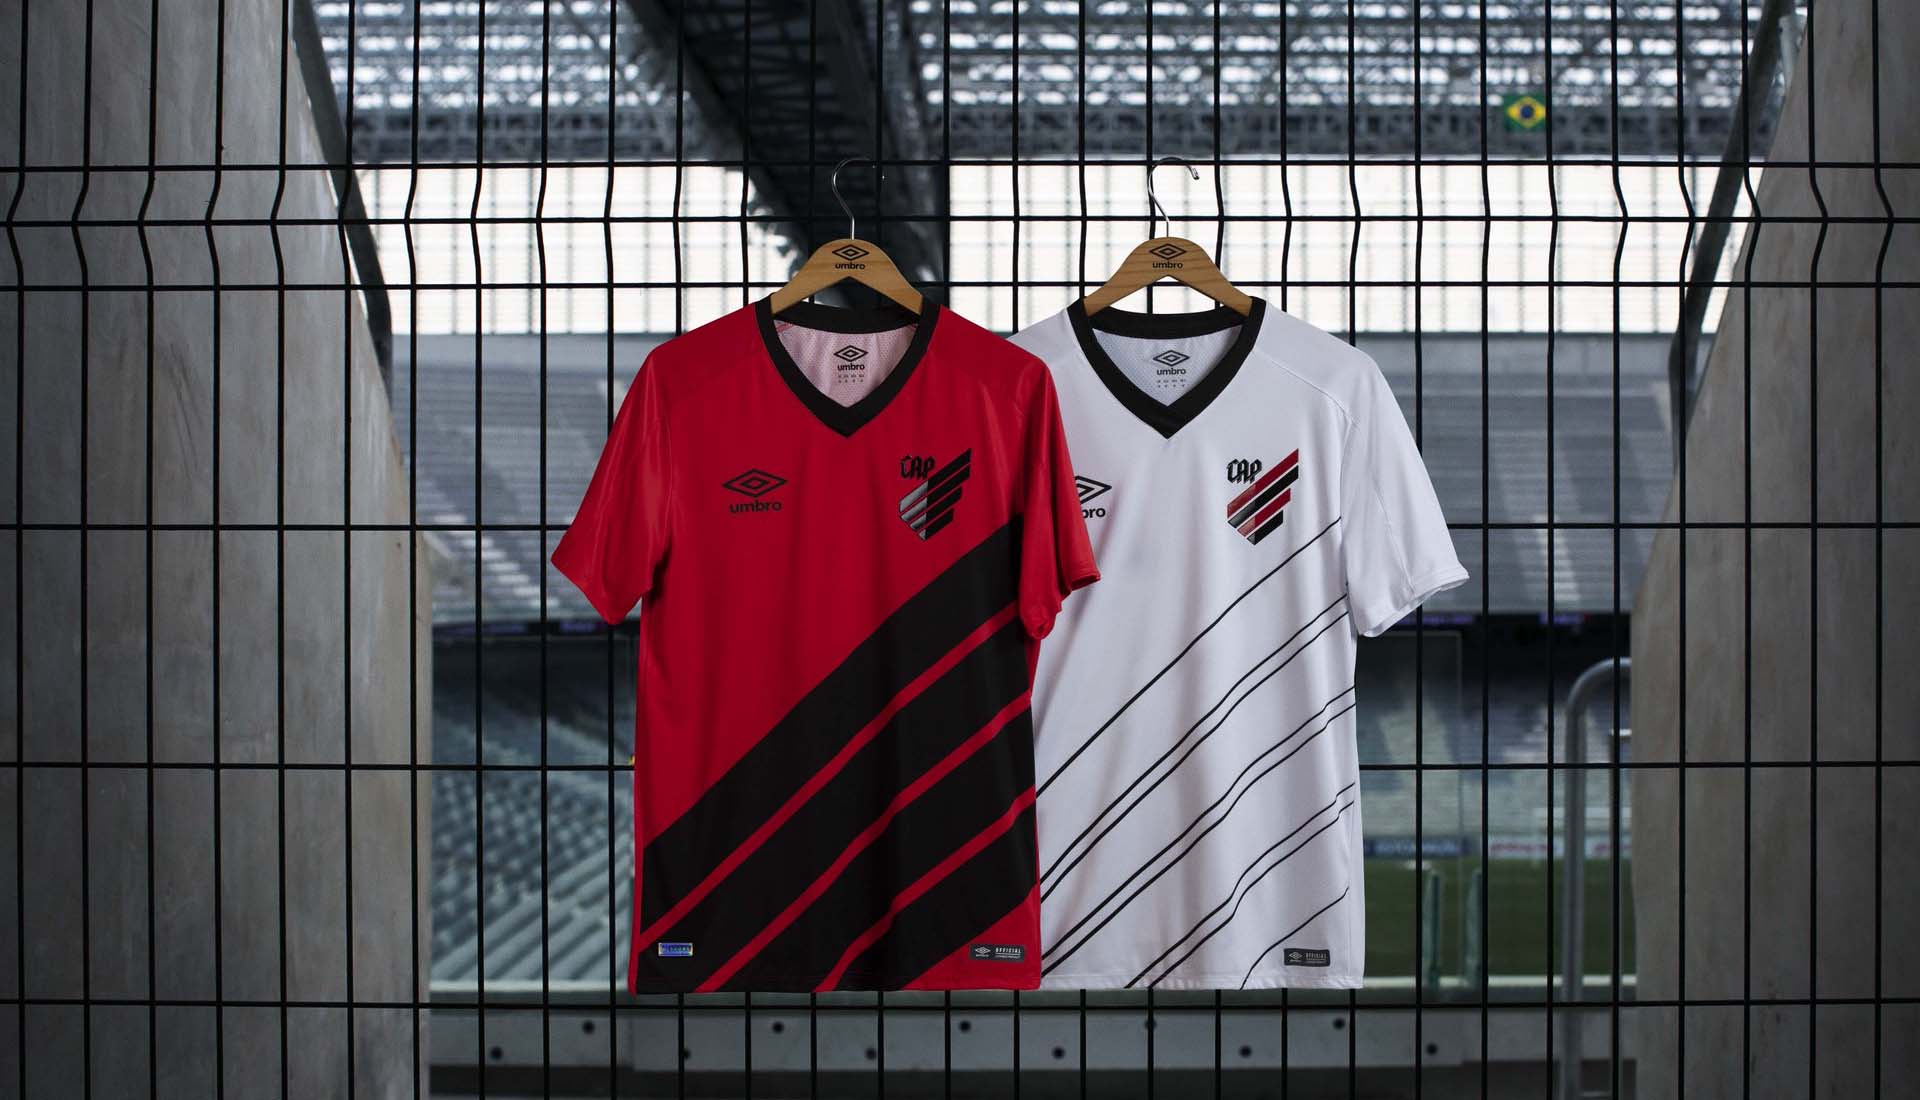 4423146c8e7 Umbro Launch Athletico Paranaense 2019 Home & Away Kits - SoccerBible.